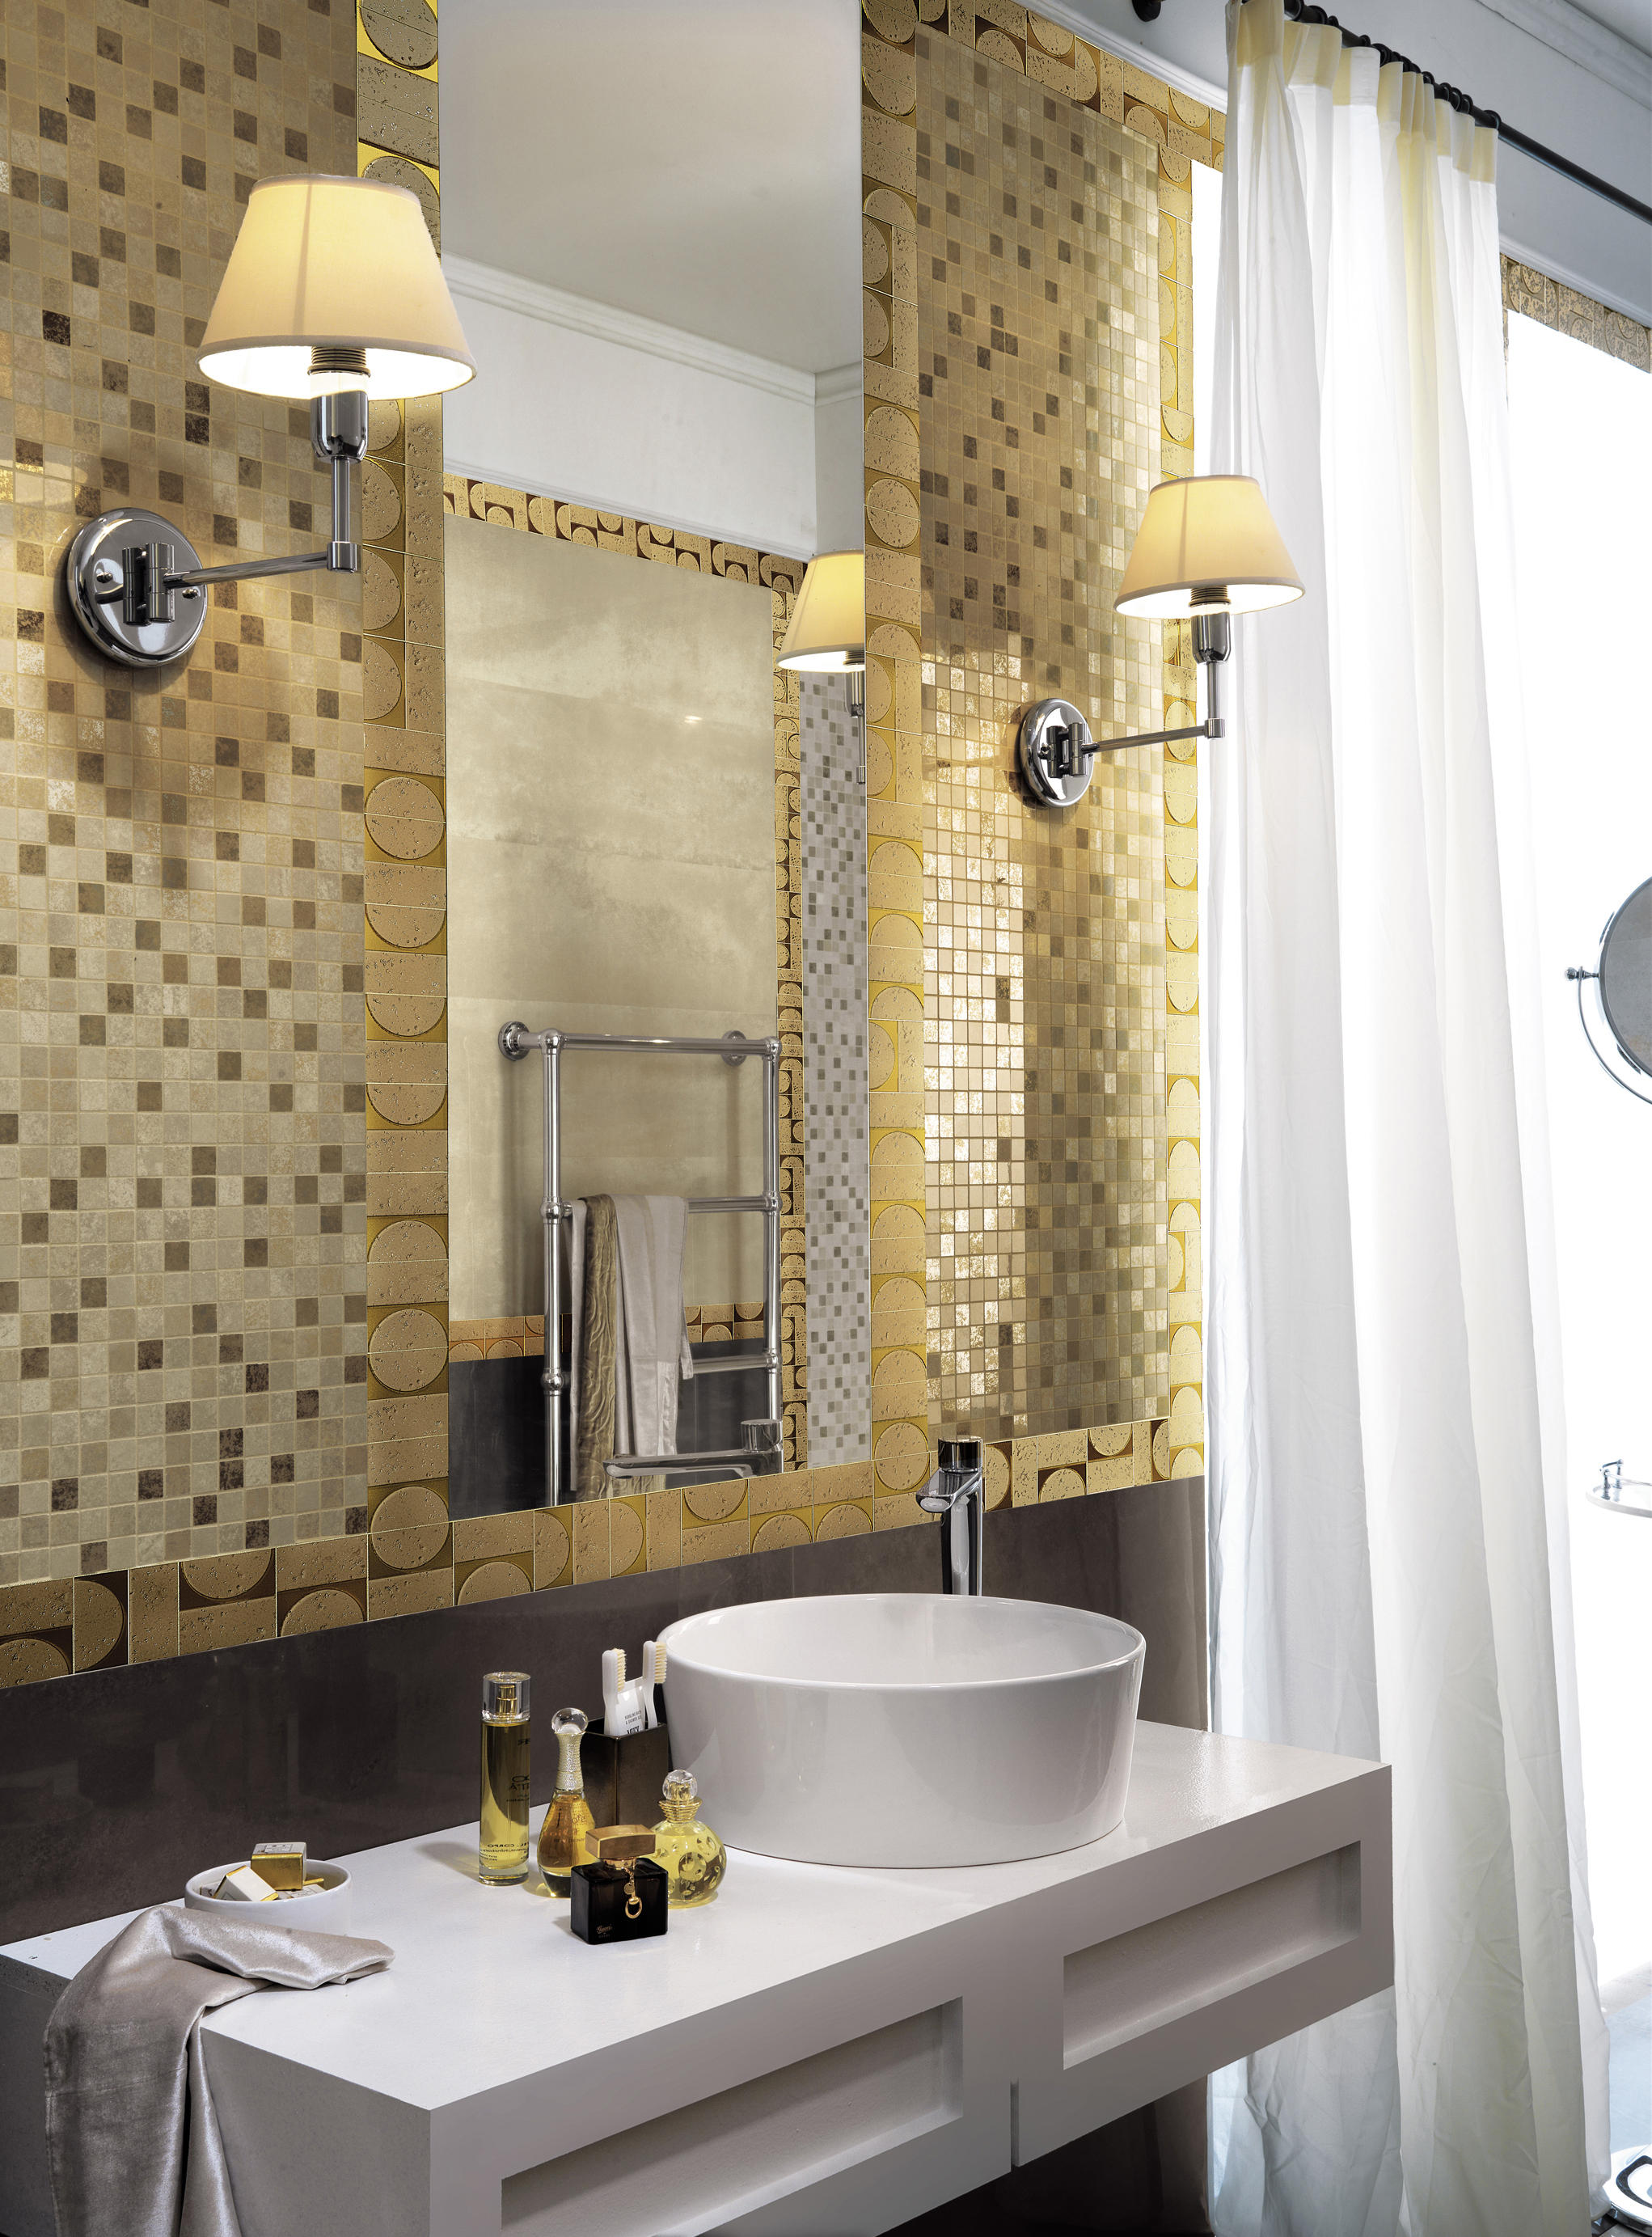 evoque white floor floor tiles from fap ceramiche. Black Bedroom Furniture Sets. Home Design Ideas